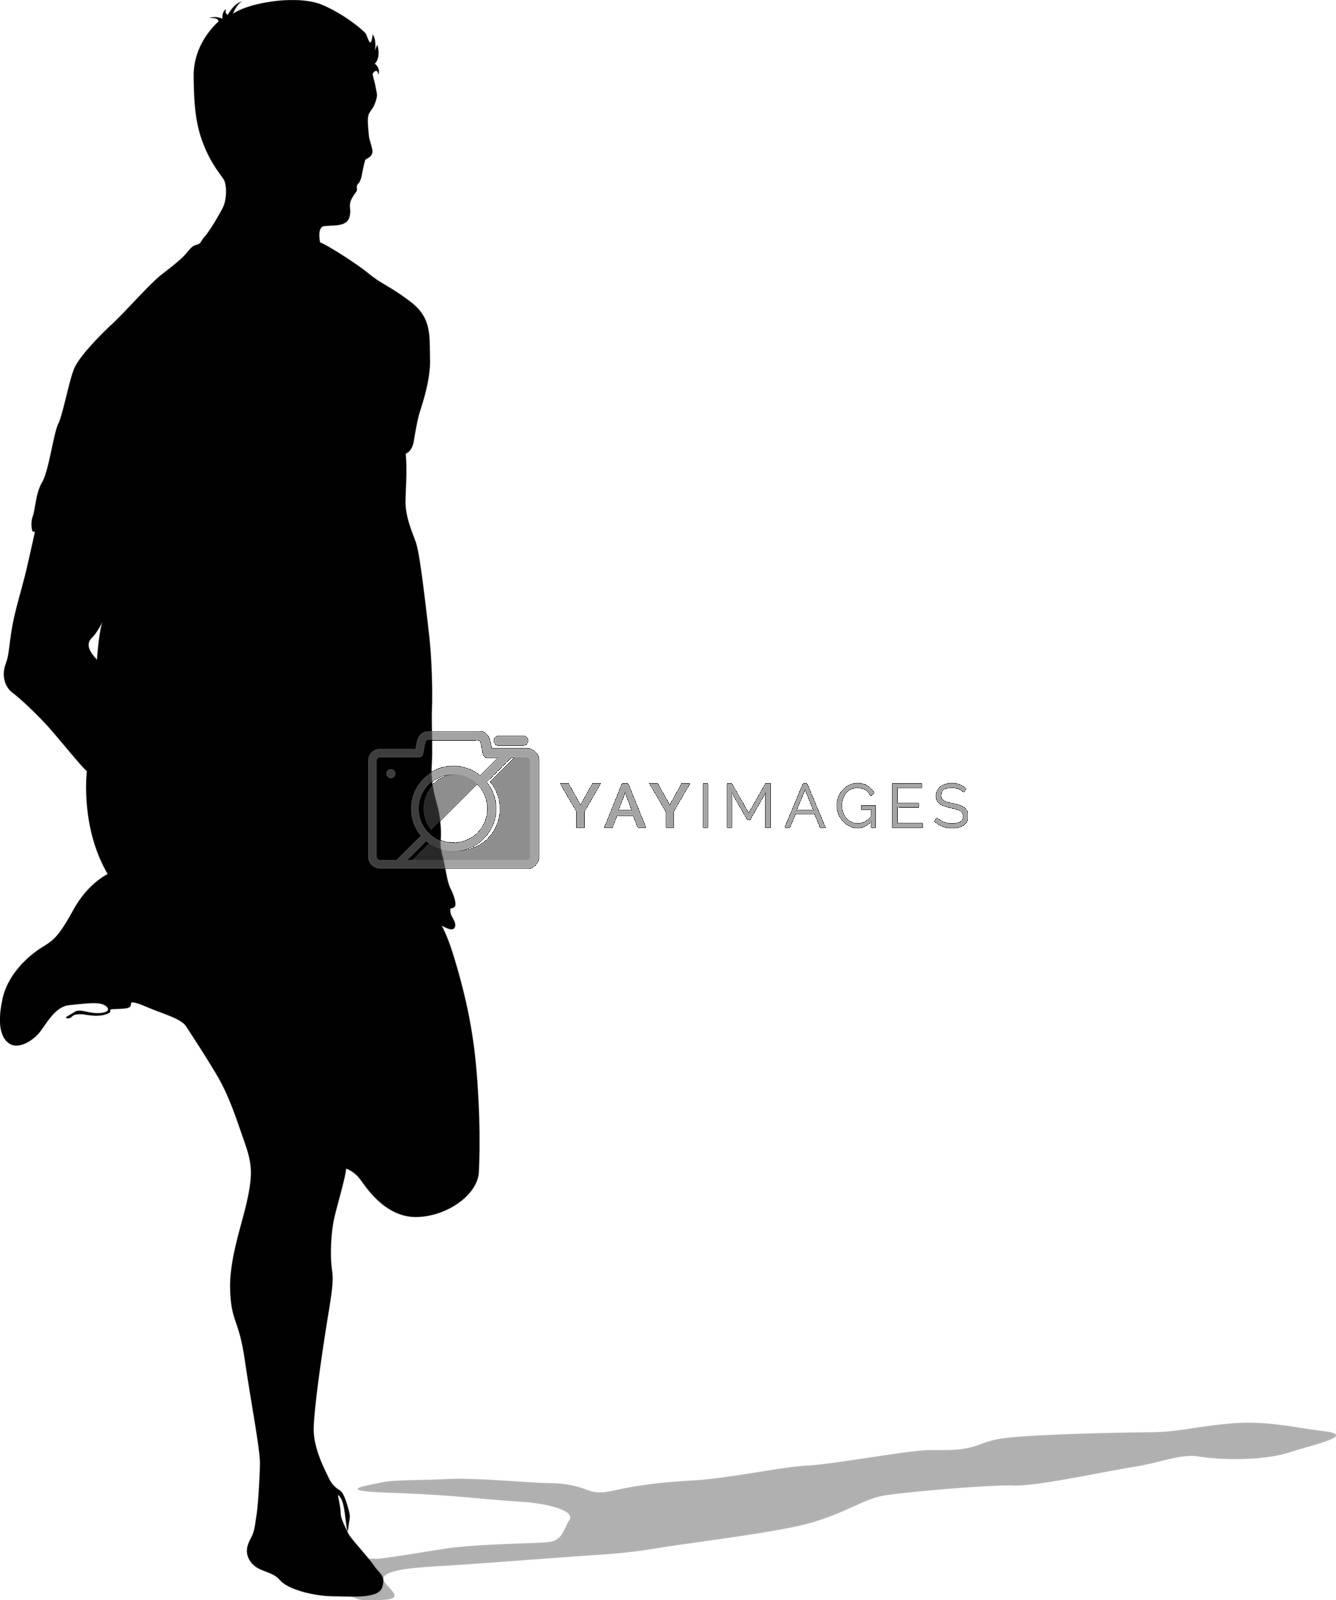 Silhouettes Runners on sprint, men. vector illustration.